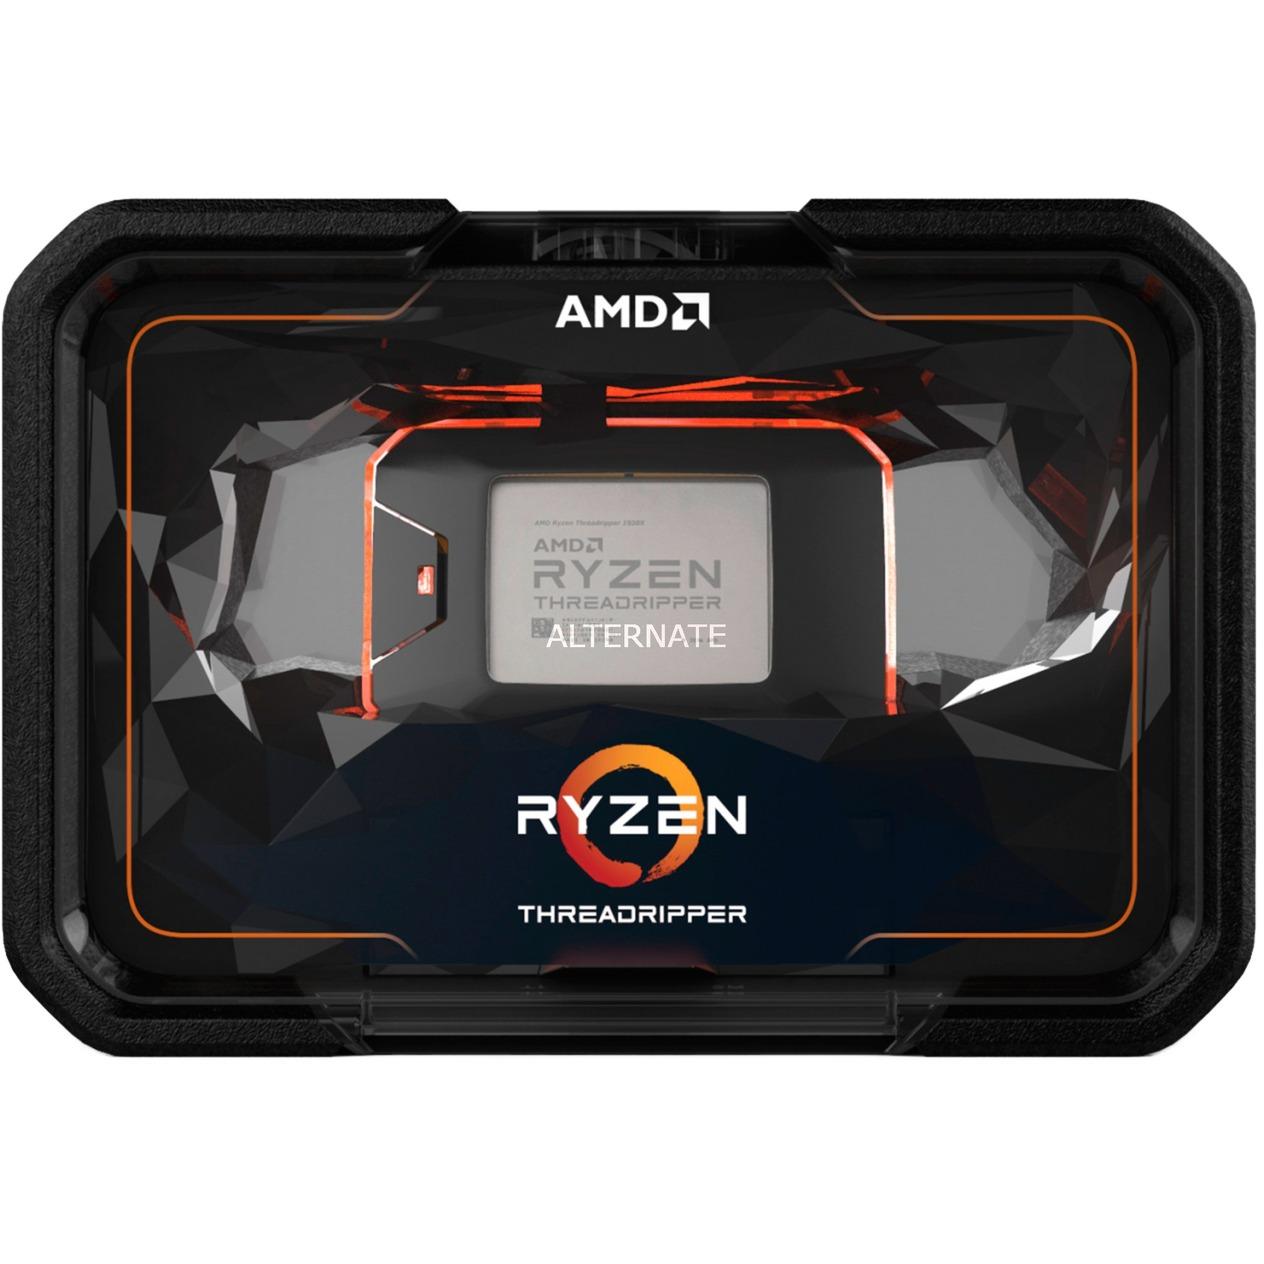 Ryzen Threadripper 2950X 3.5GHz 32MB L3 Caja procesador